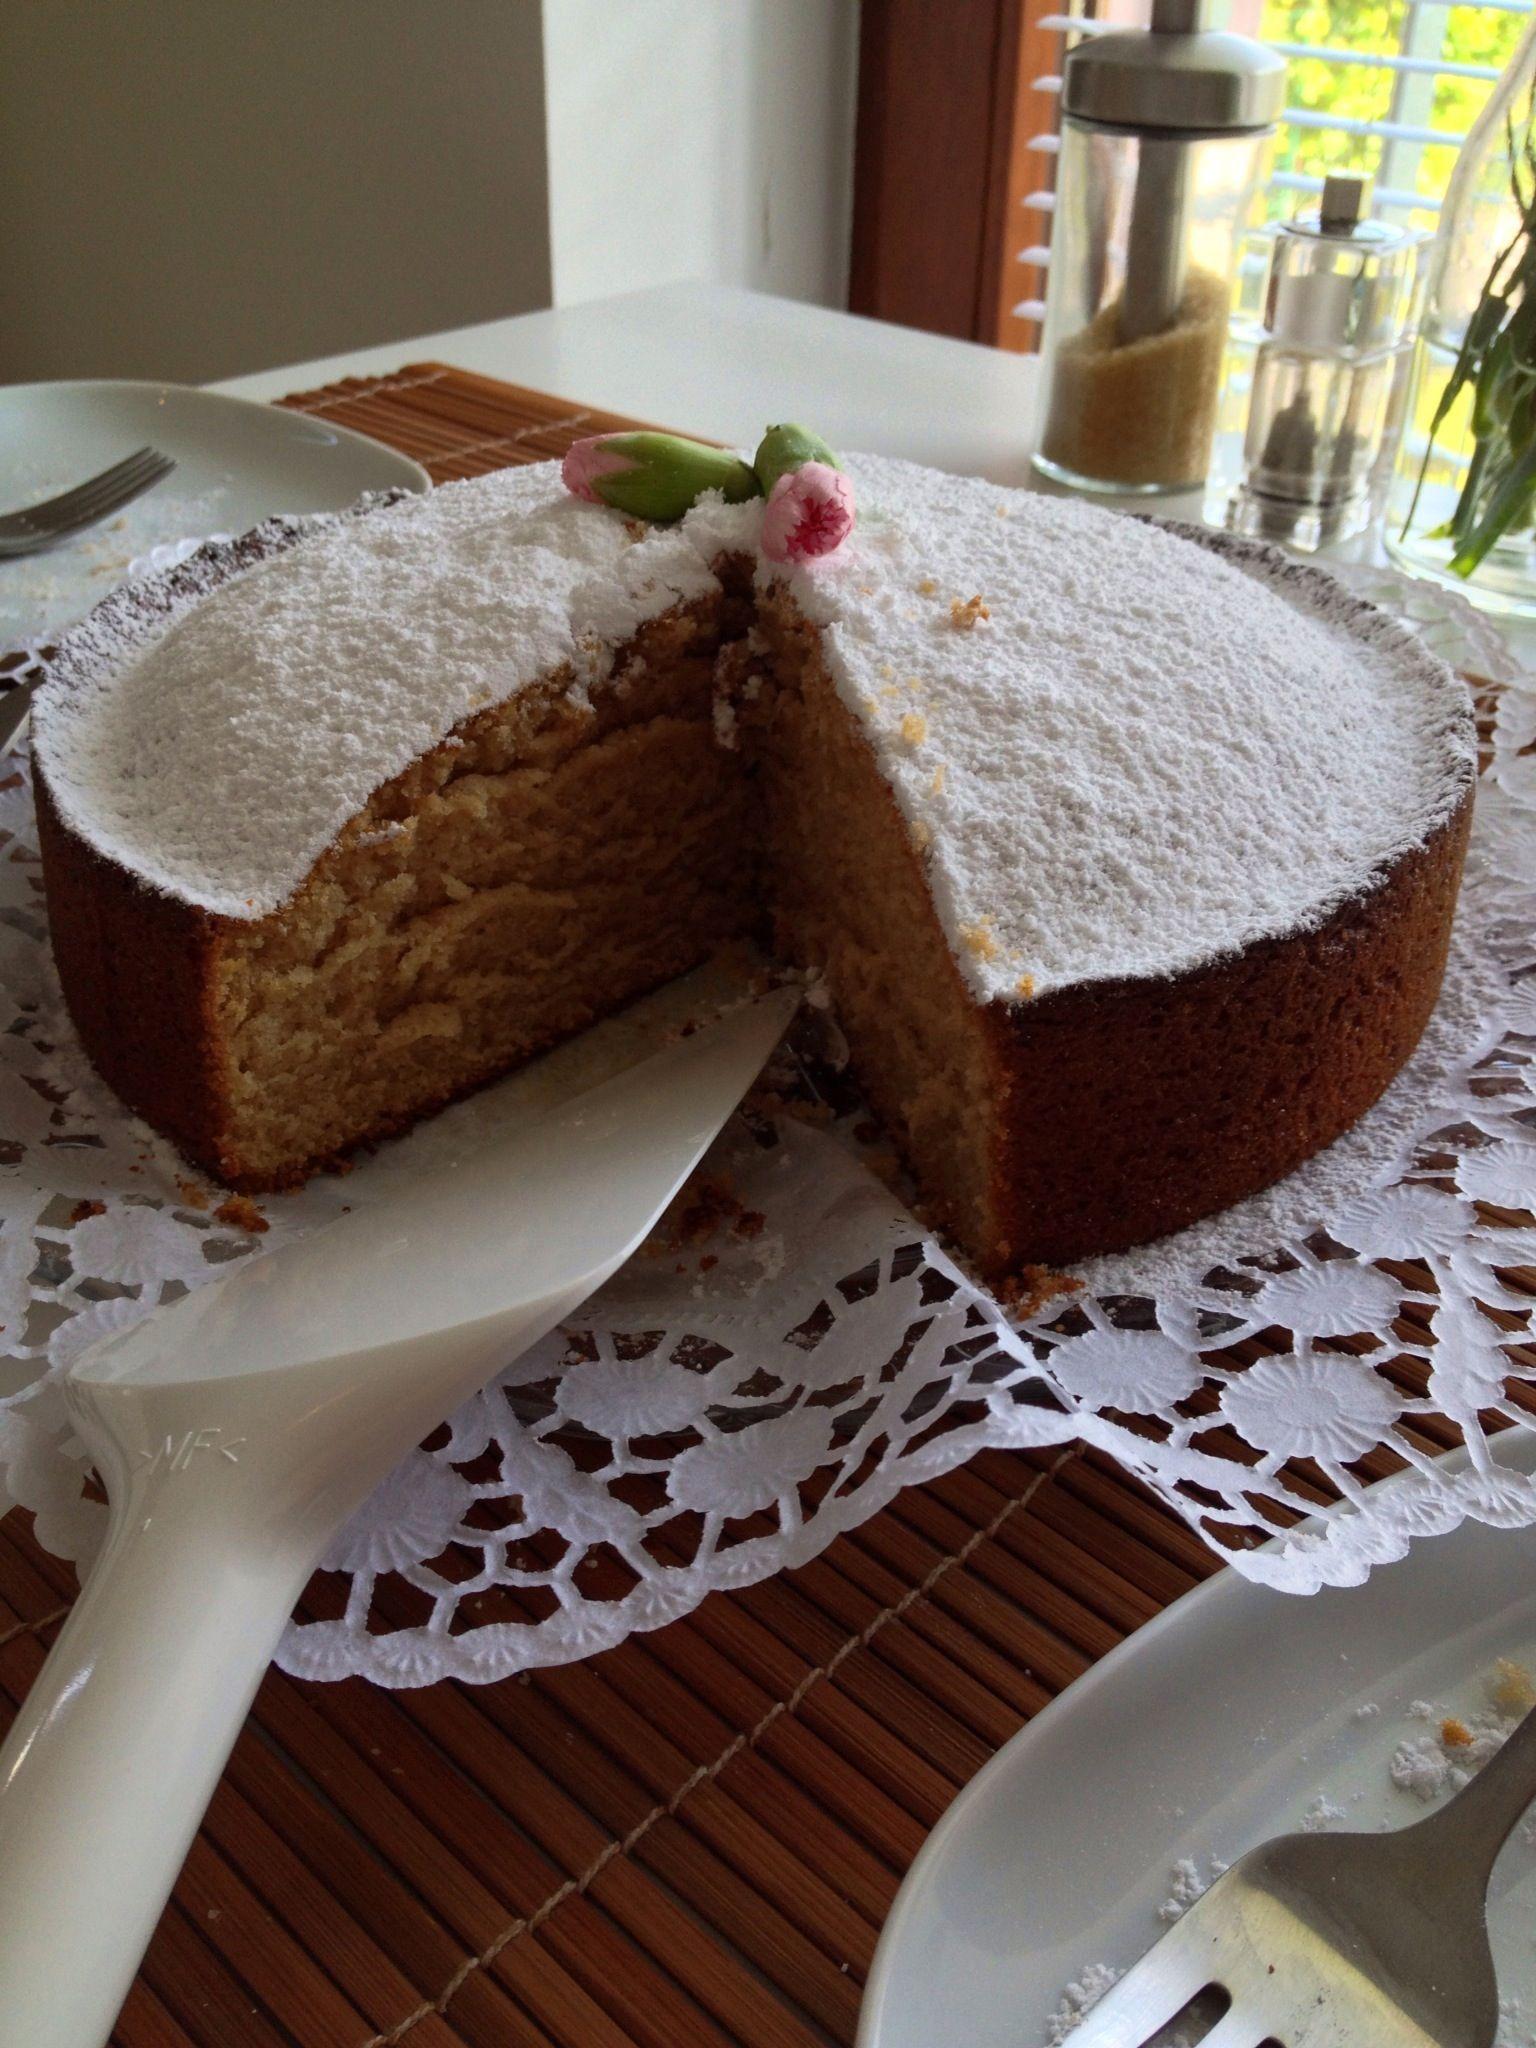 Earl grey tea cake tea cakes desserts baking